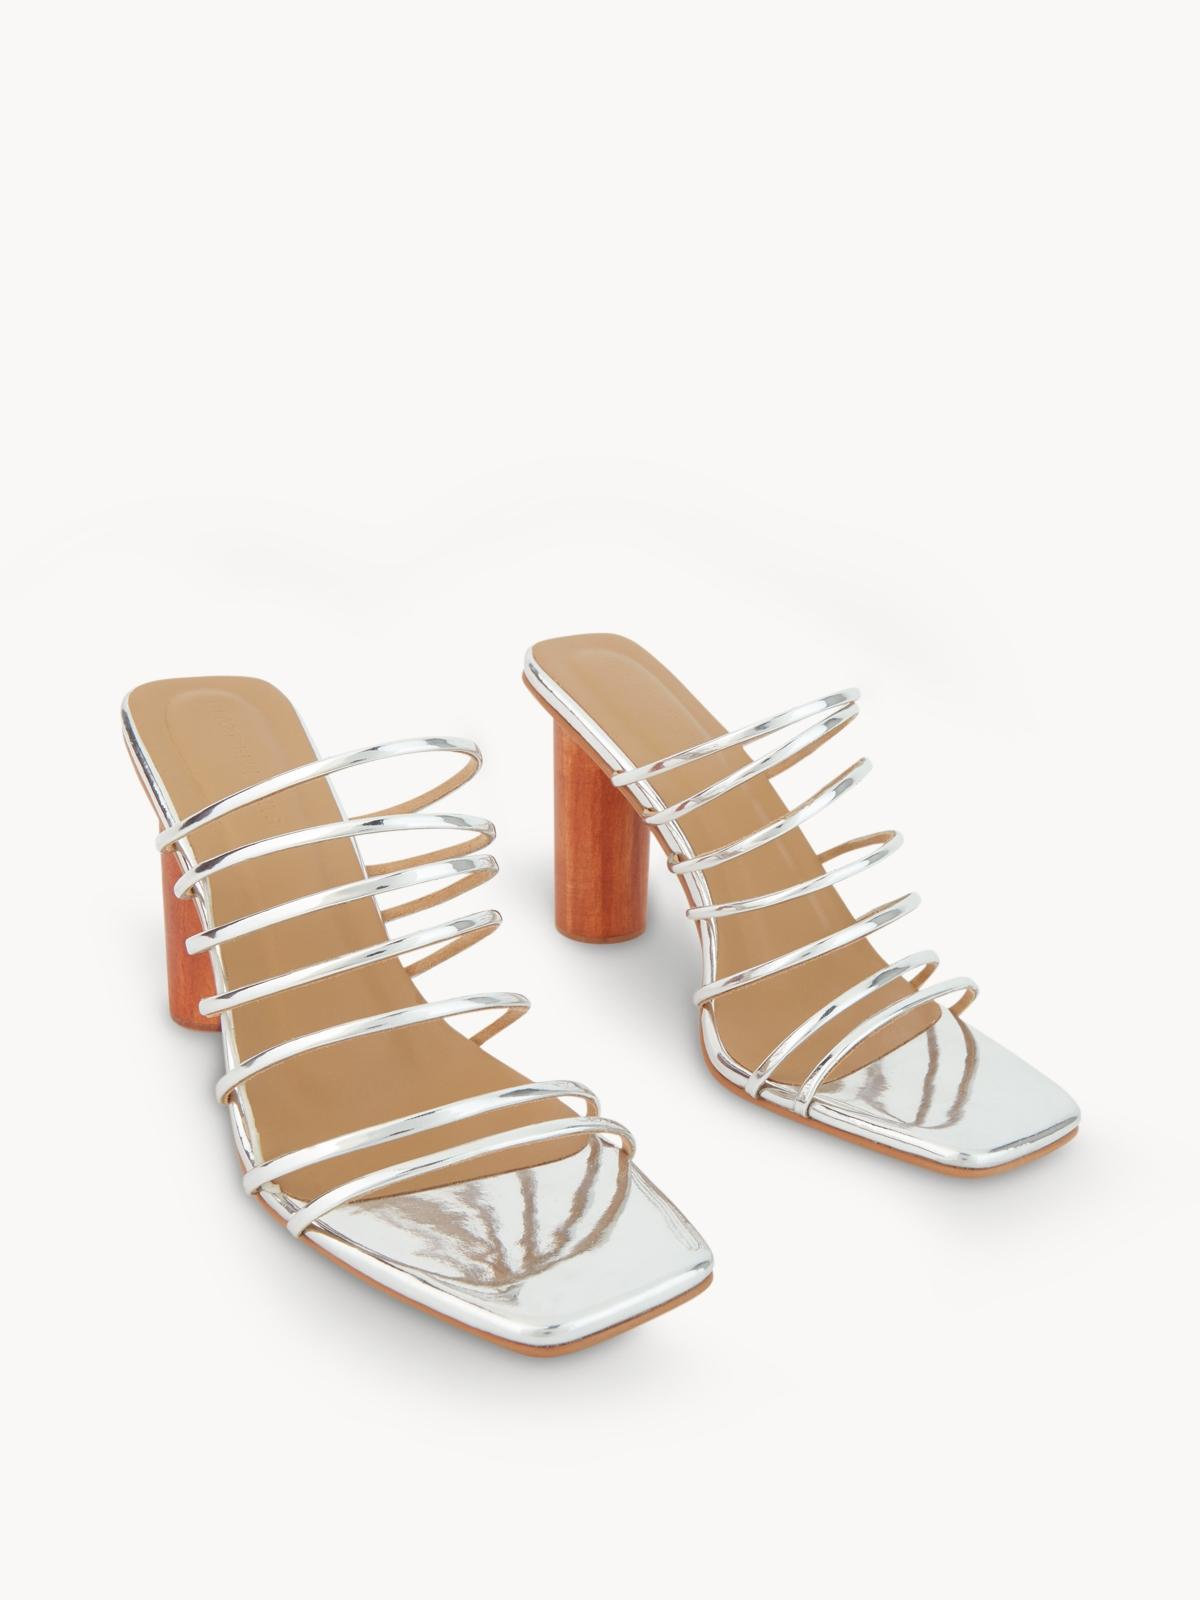 Blaze Candice Strappy Wooden Heels Silver